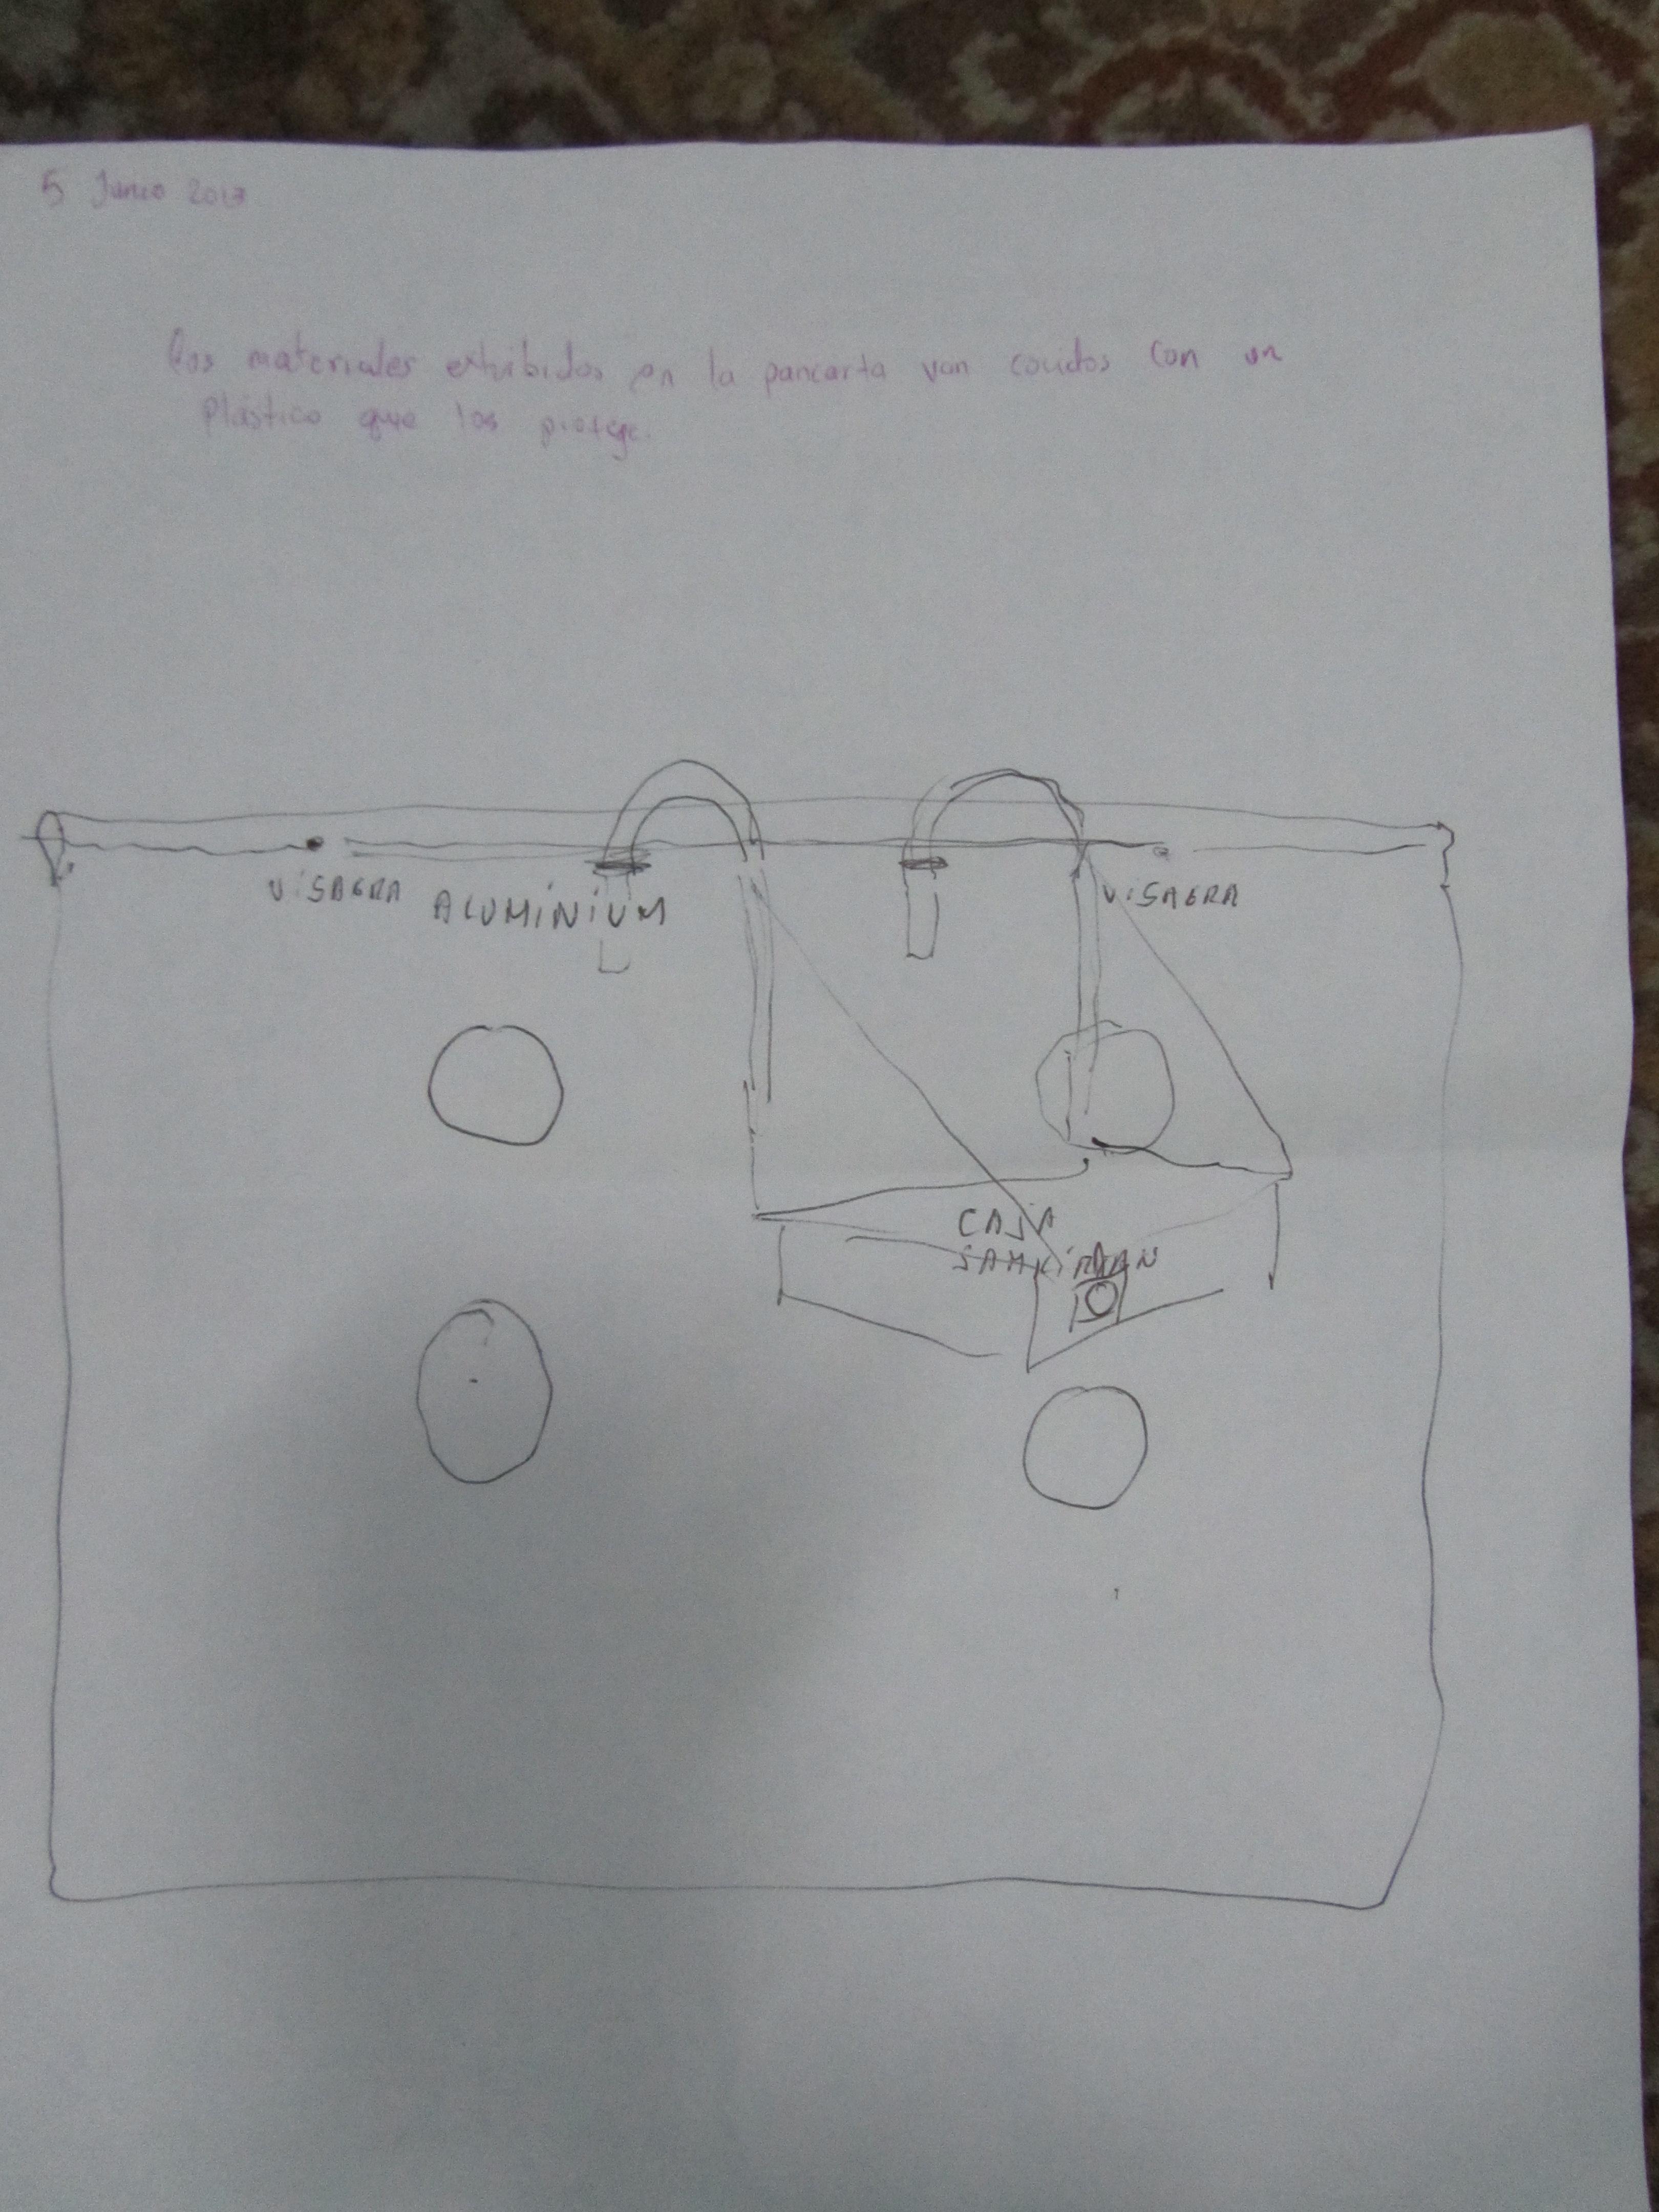 http://gurumaharaj.net/hombrepancarta/hombrepancarta3.JPG